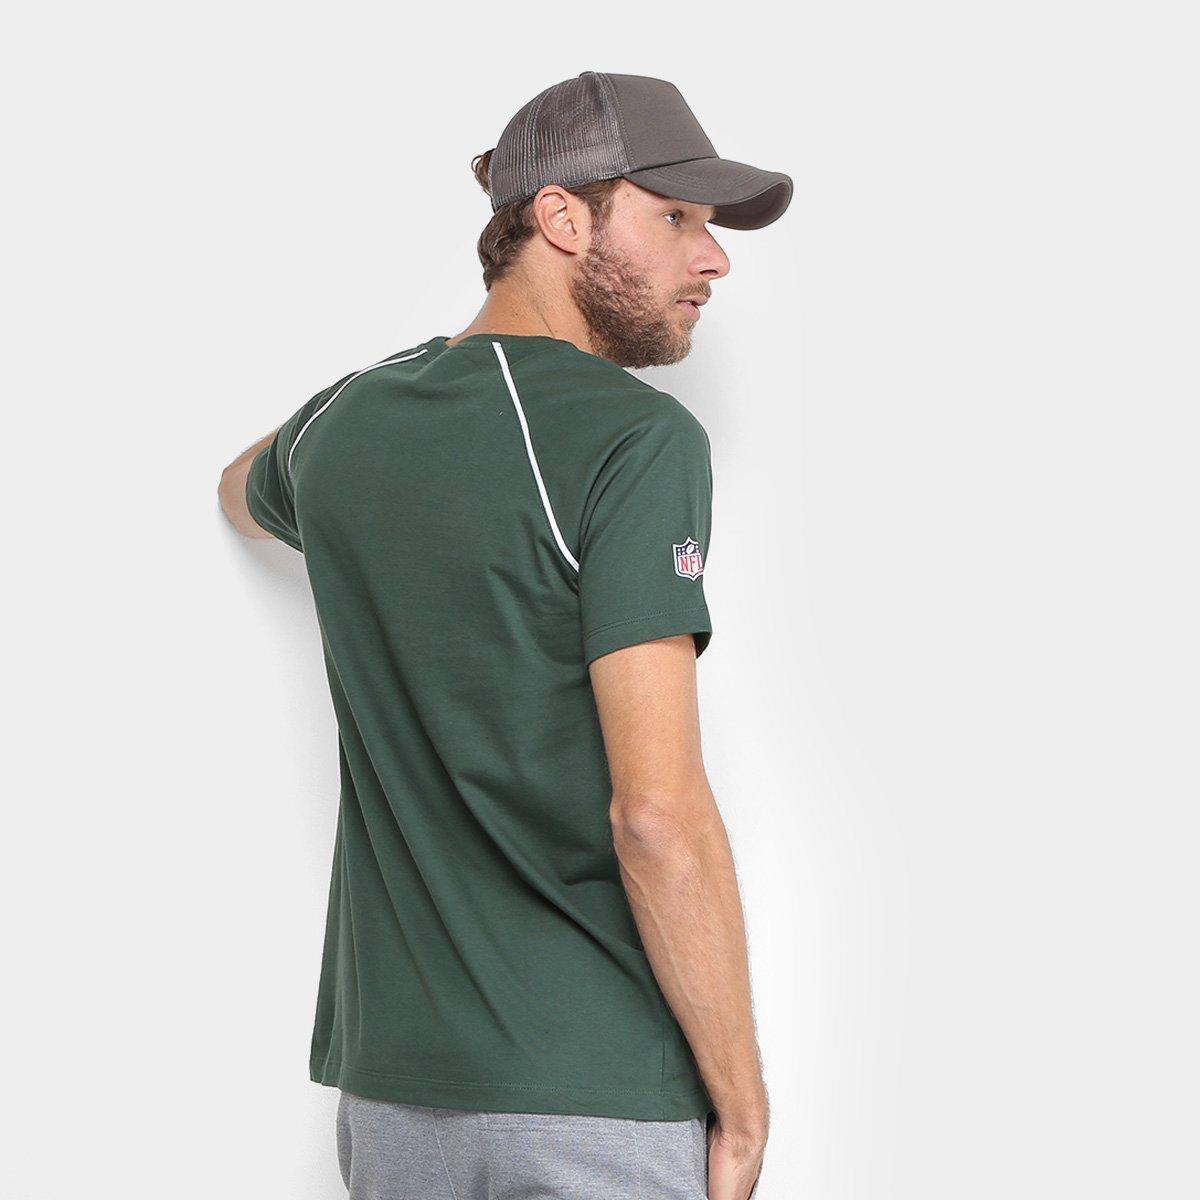 ... Camiseta NFL Green Bay Packers New Era Letter Sport Vein 17 Masculina  ... a7b7ed4bc97